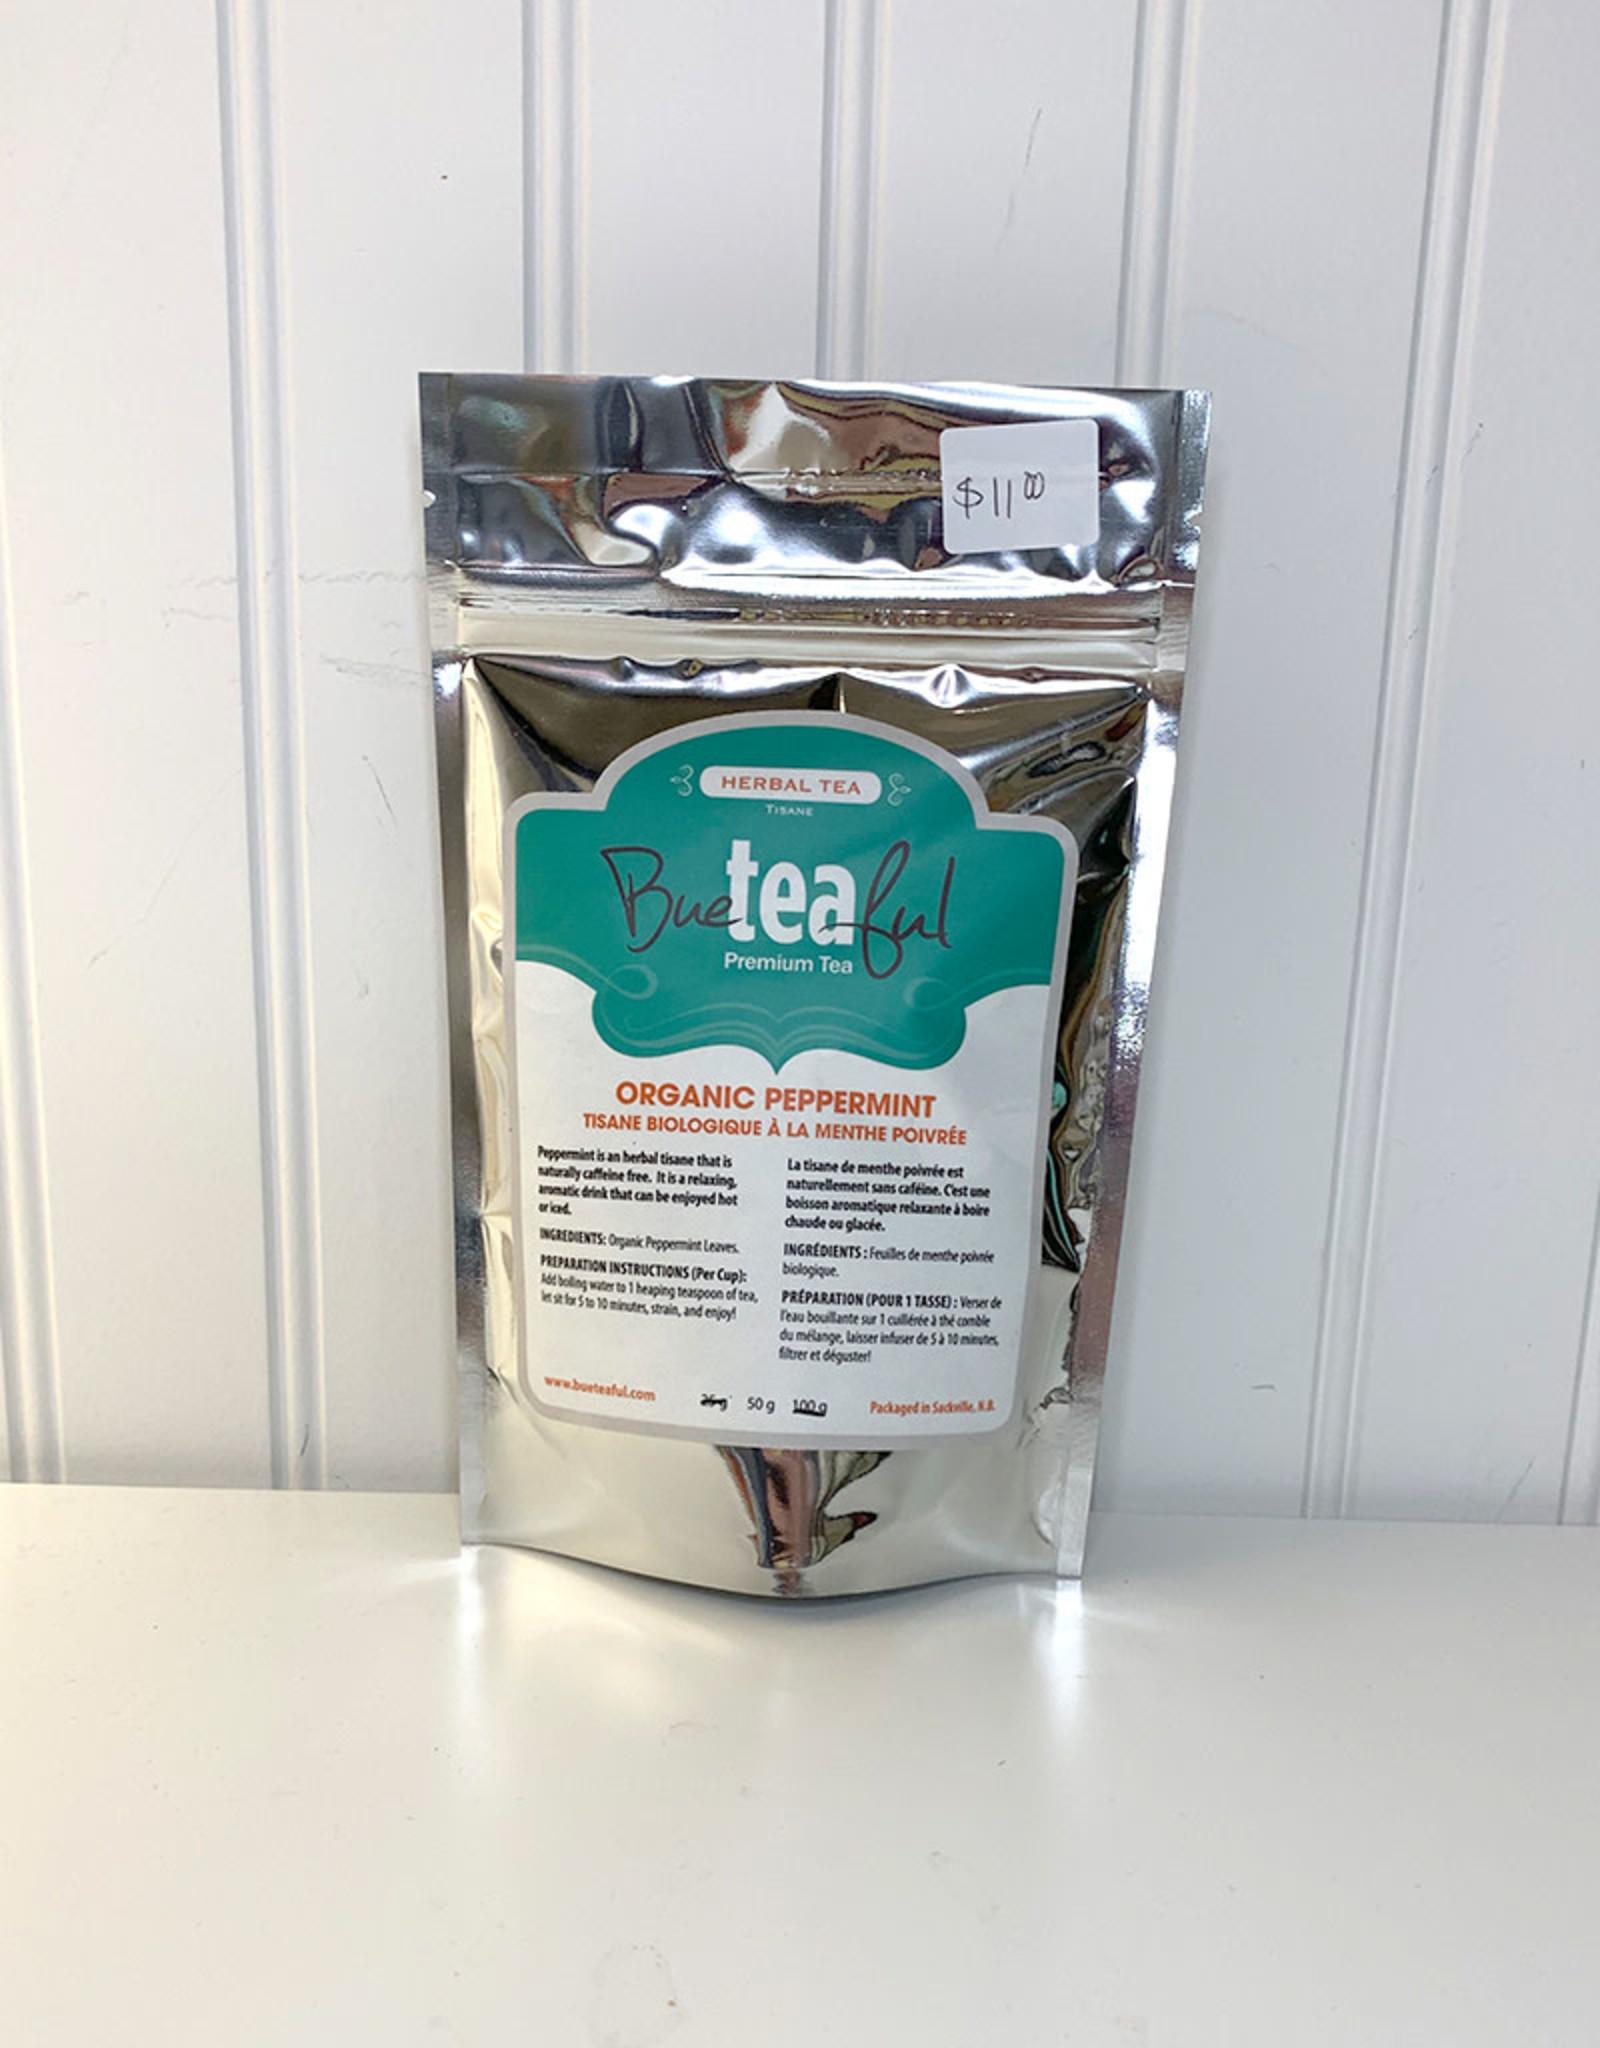 Bueteaful Tea Bueteaful - Tea, Peppermint